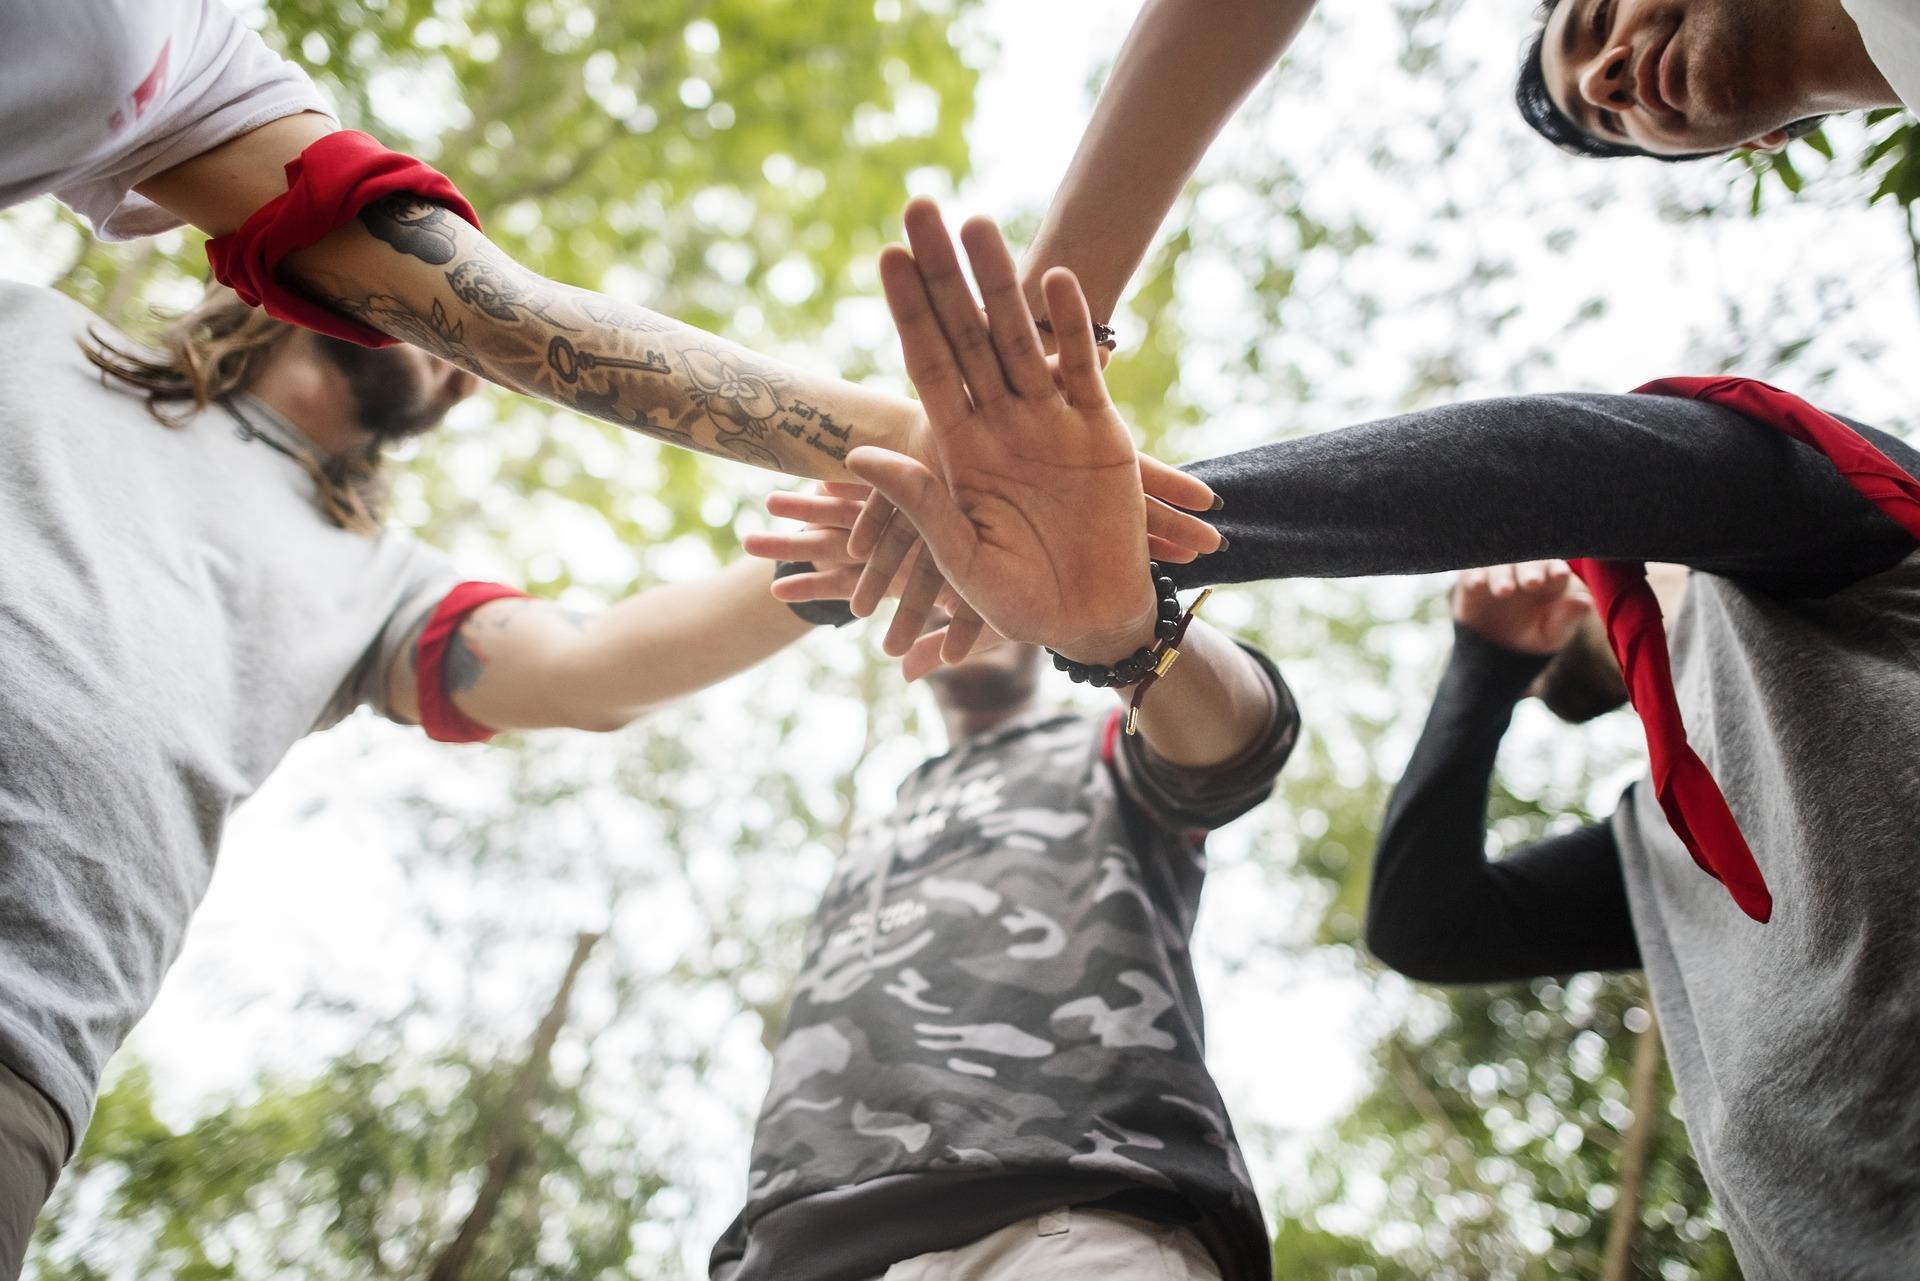 WALDLIFE David Cornette - Programm Teambuidling